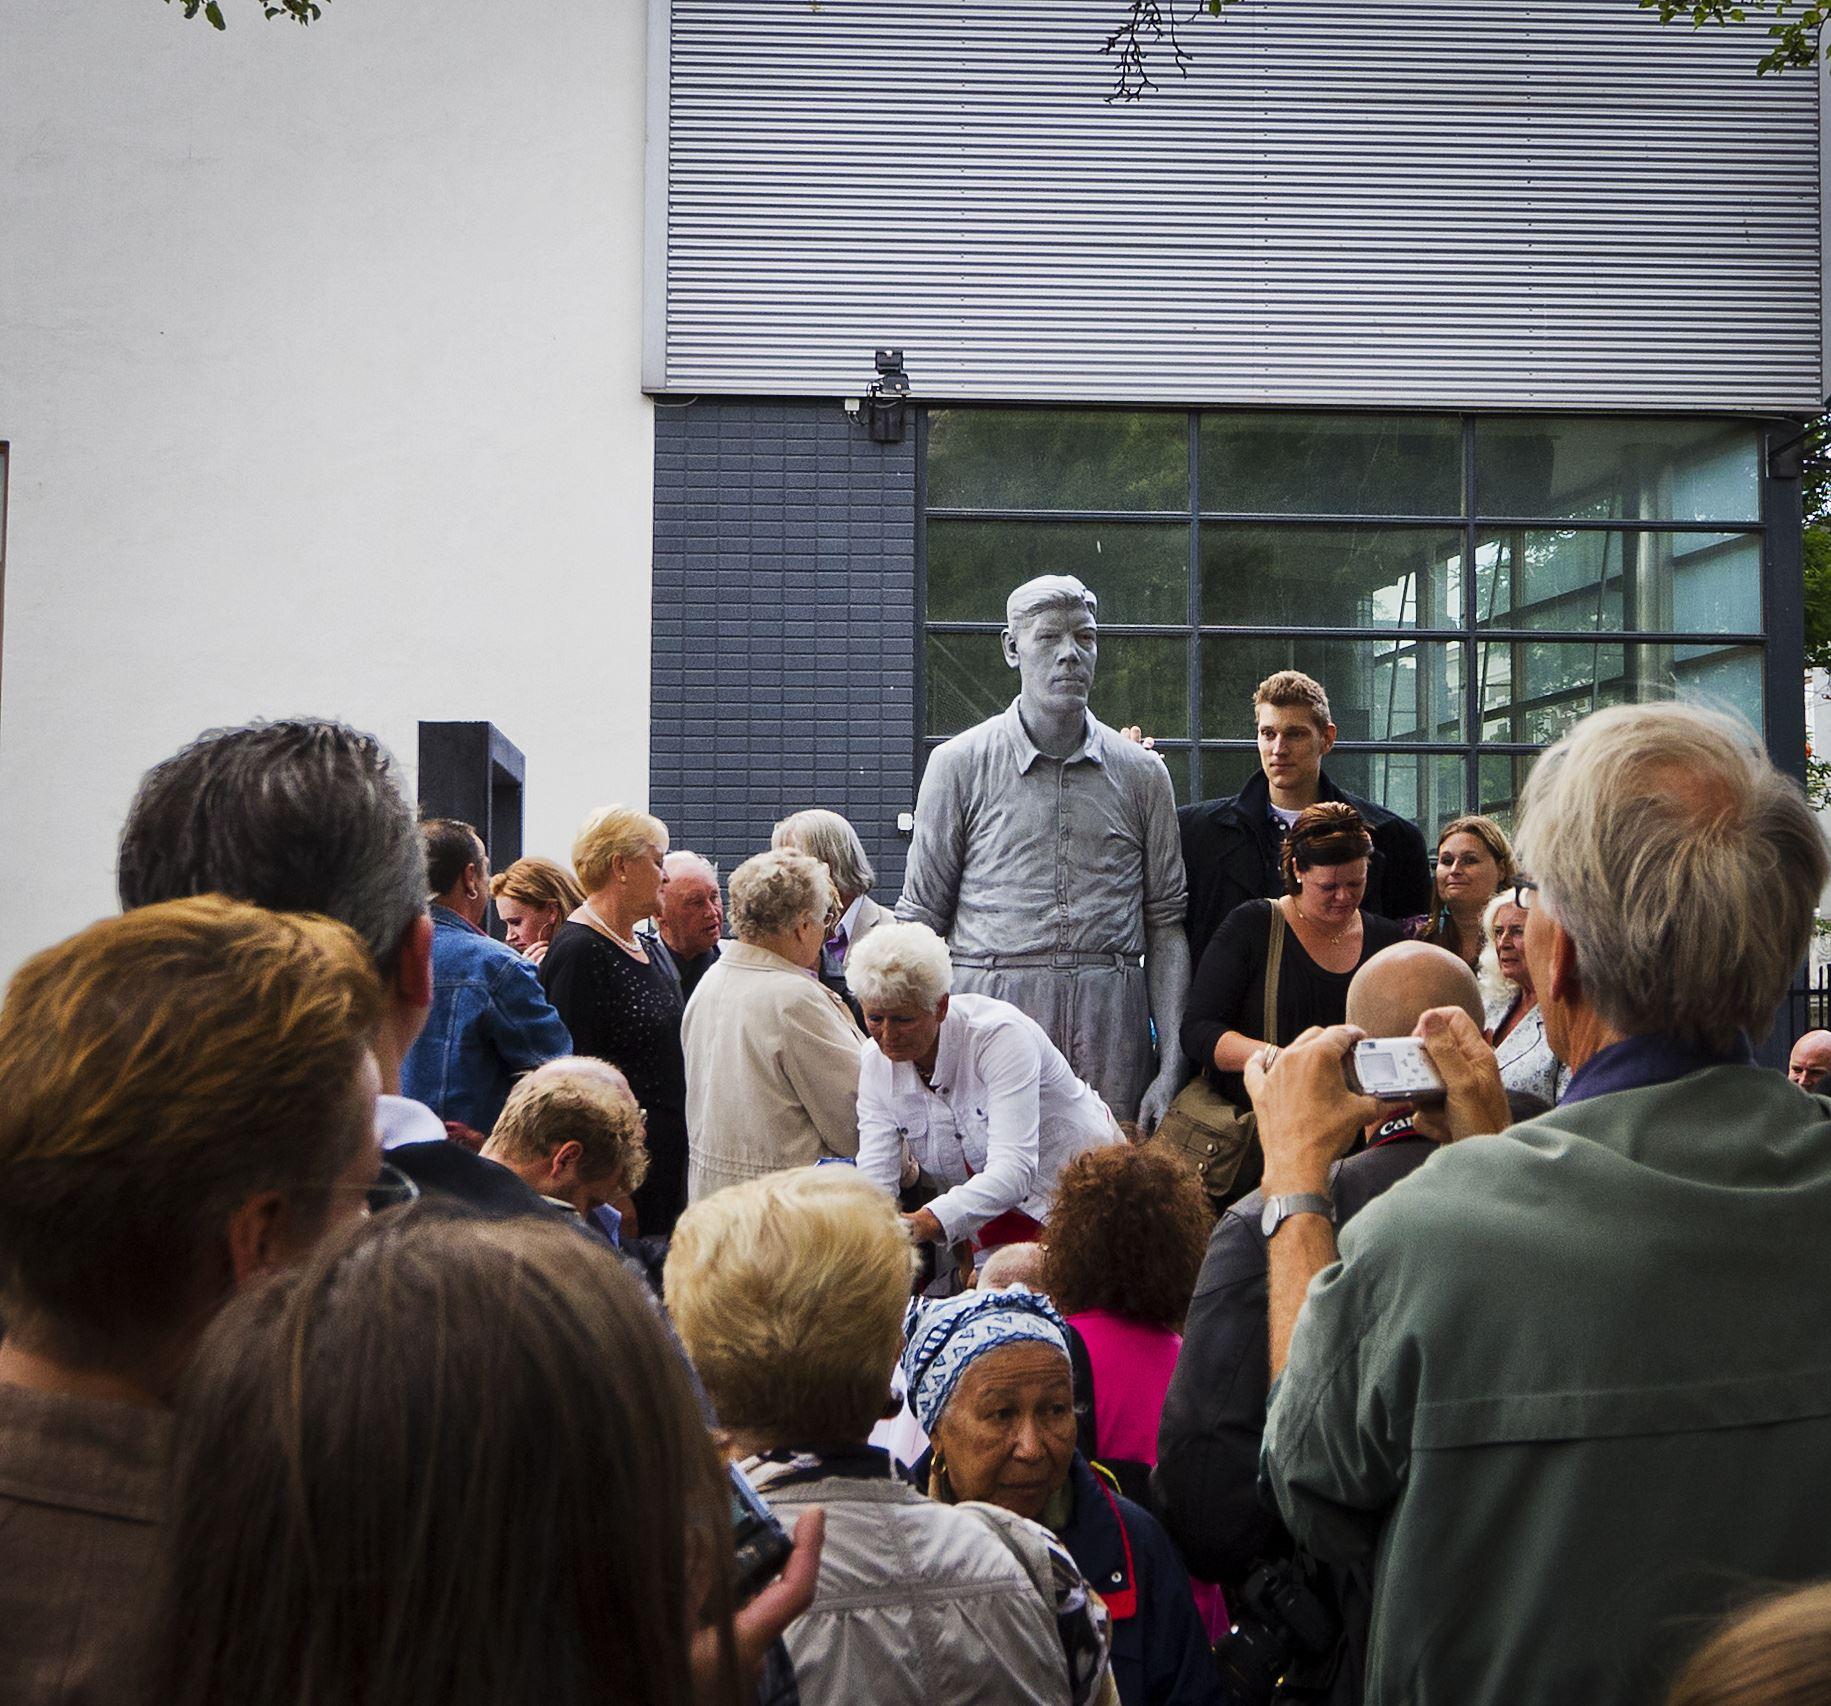 Rigardus Rijnhout